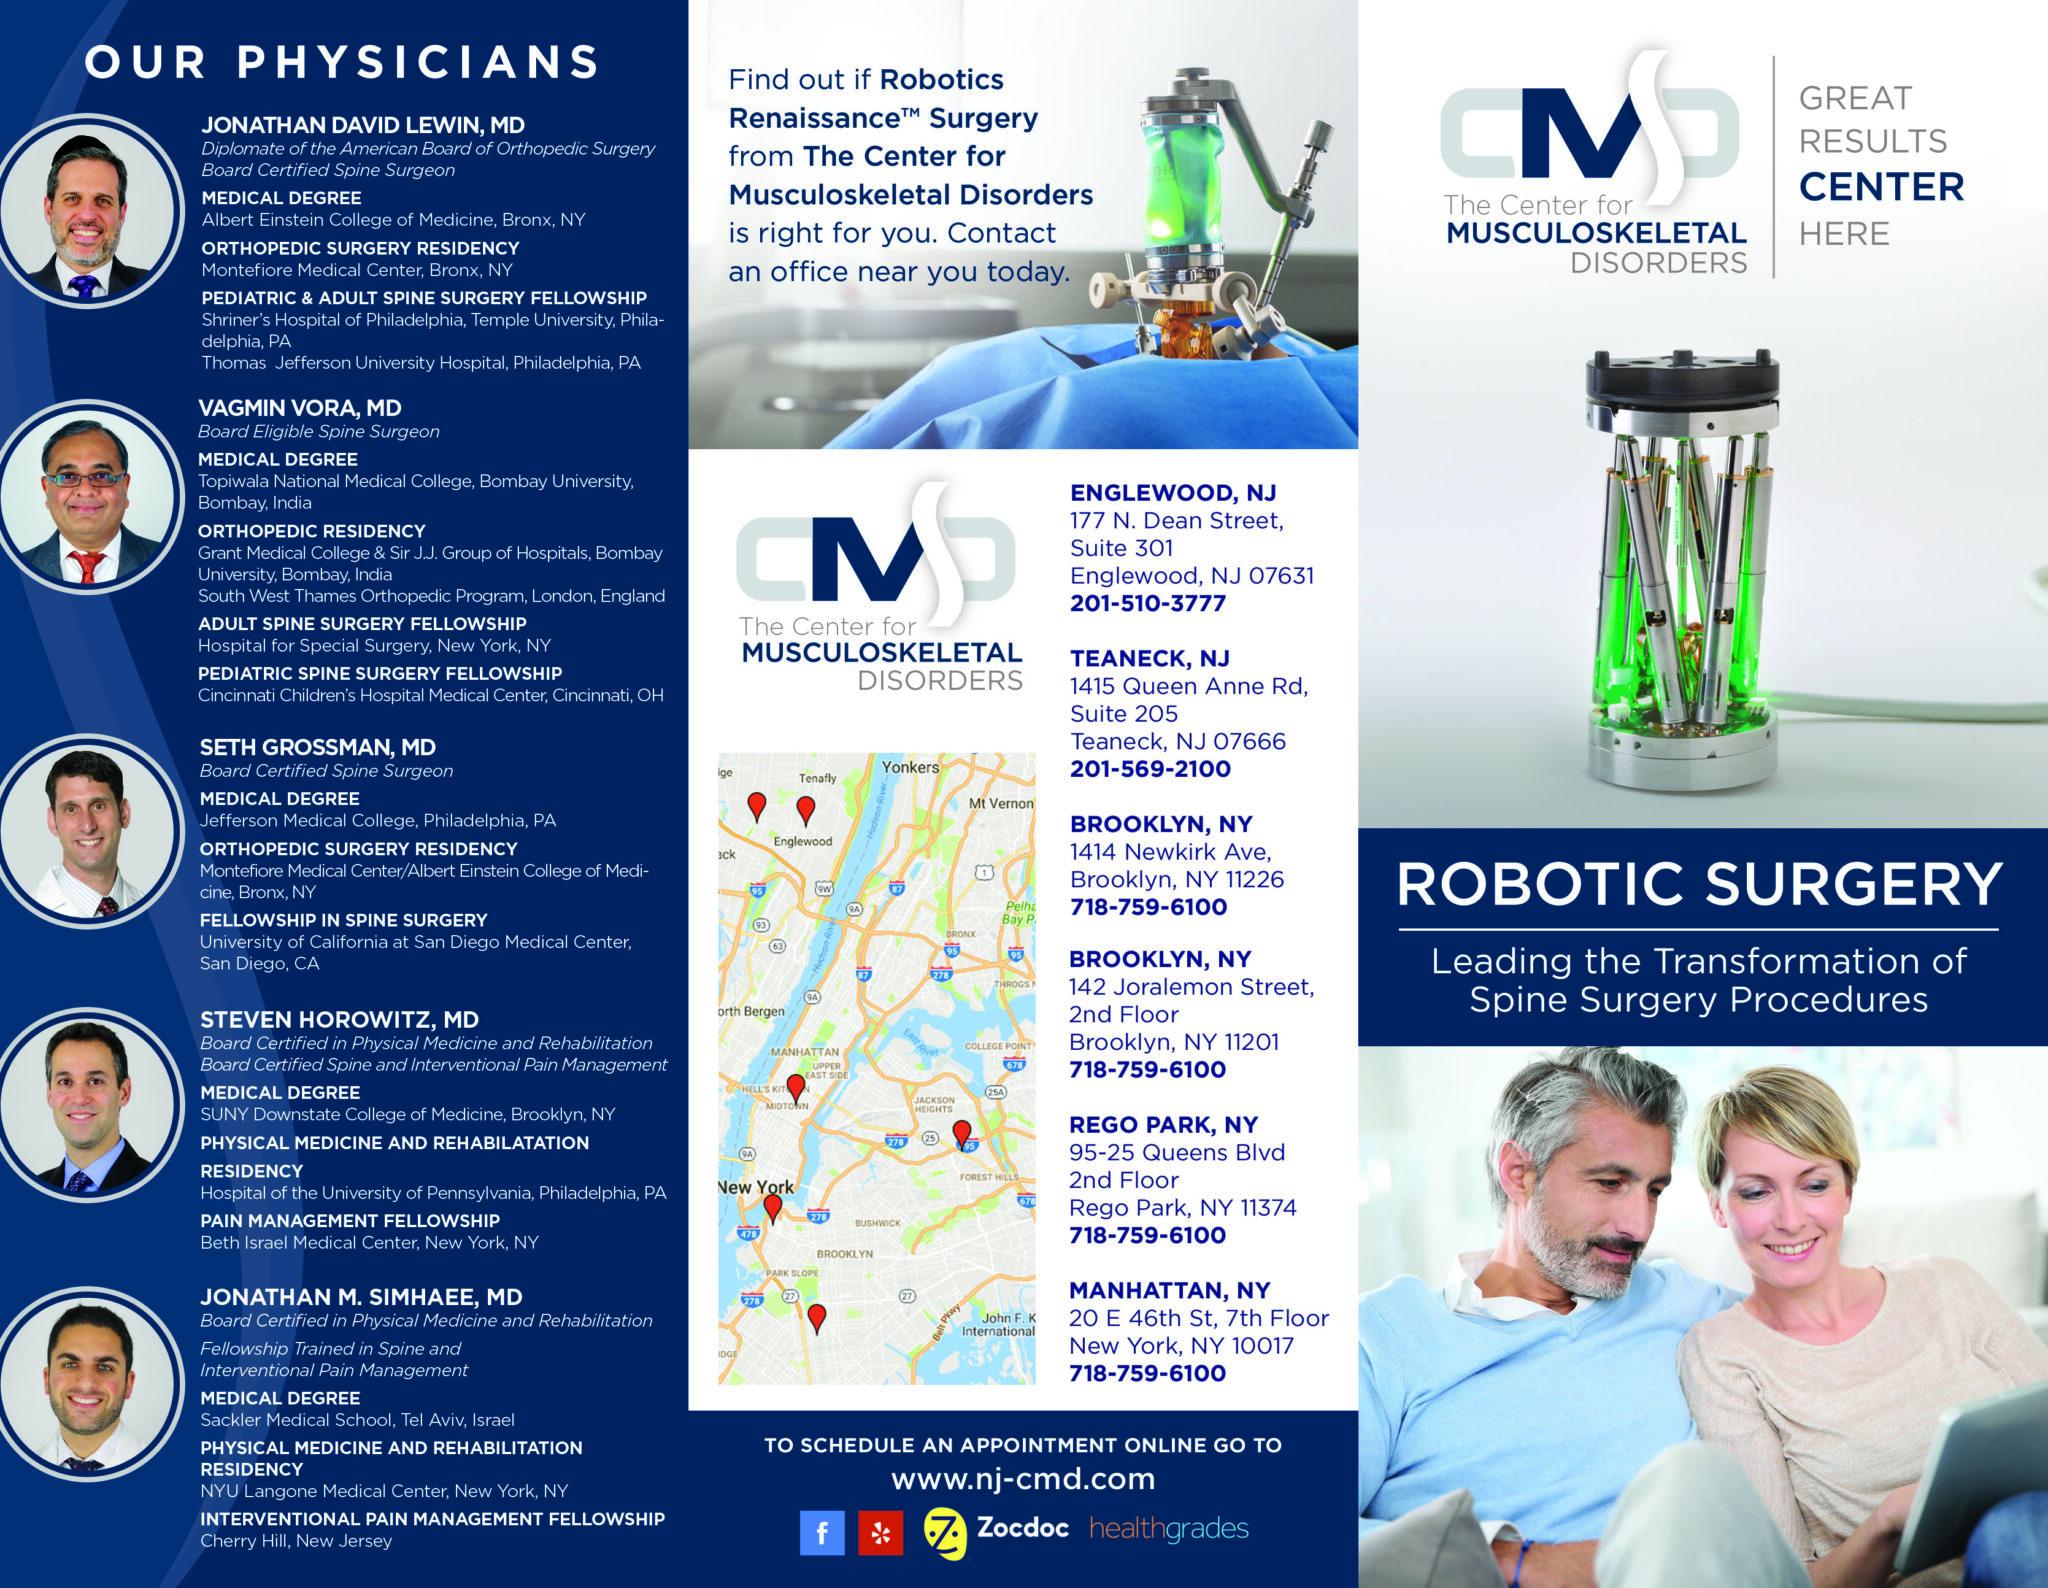 robotic surgery brochure design